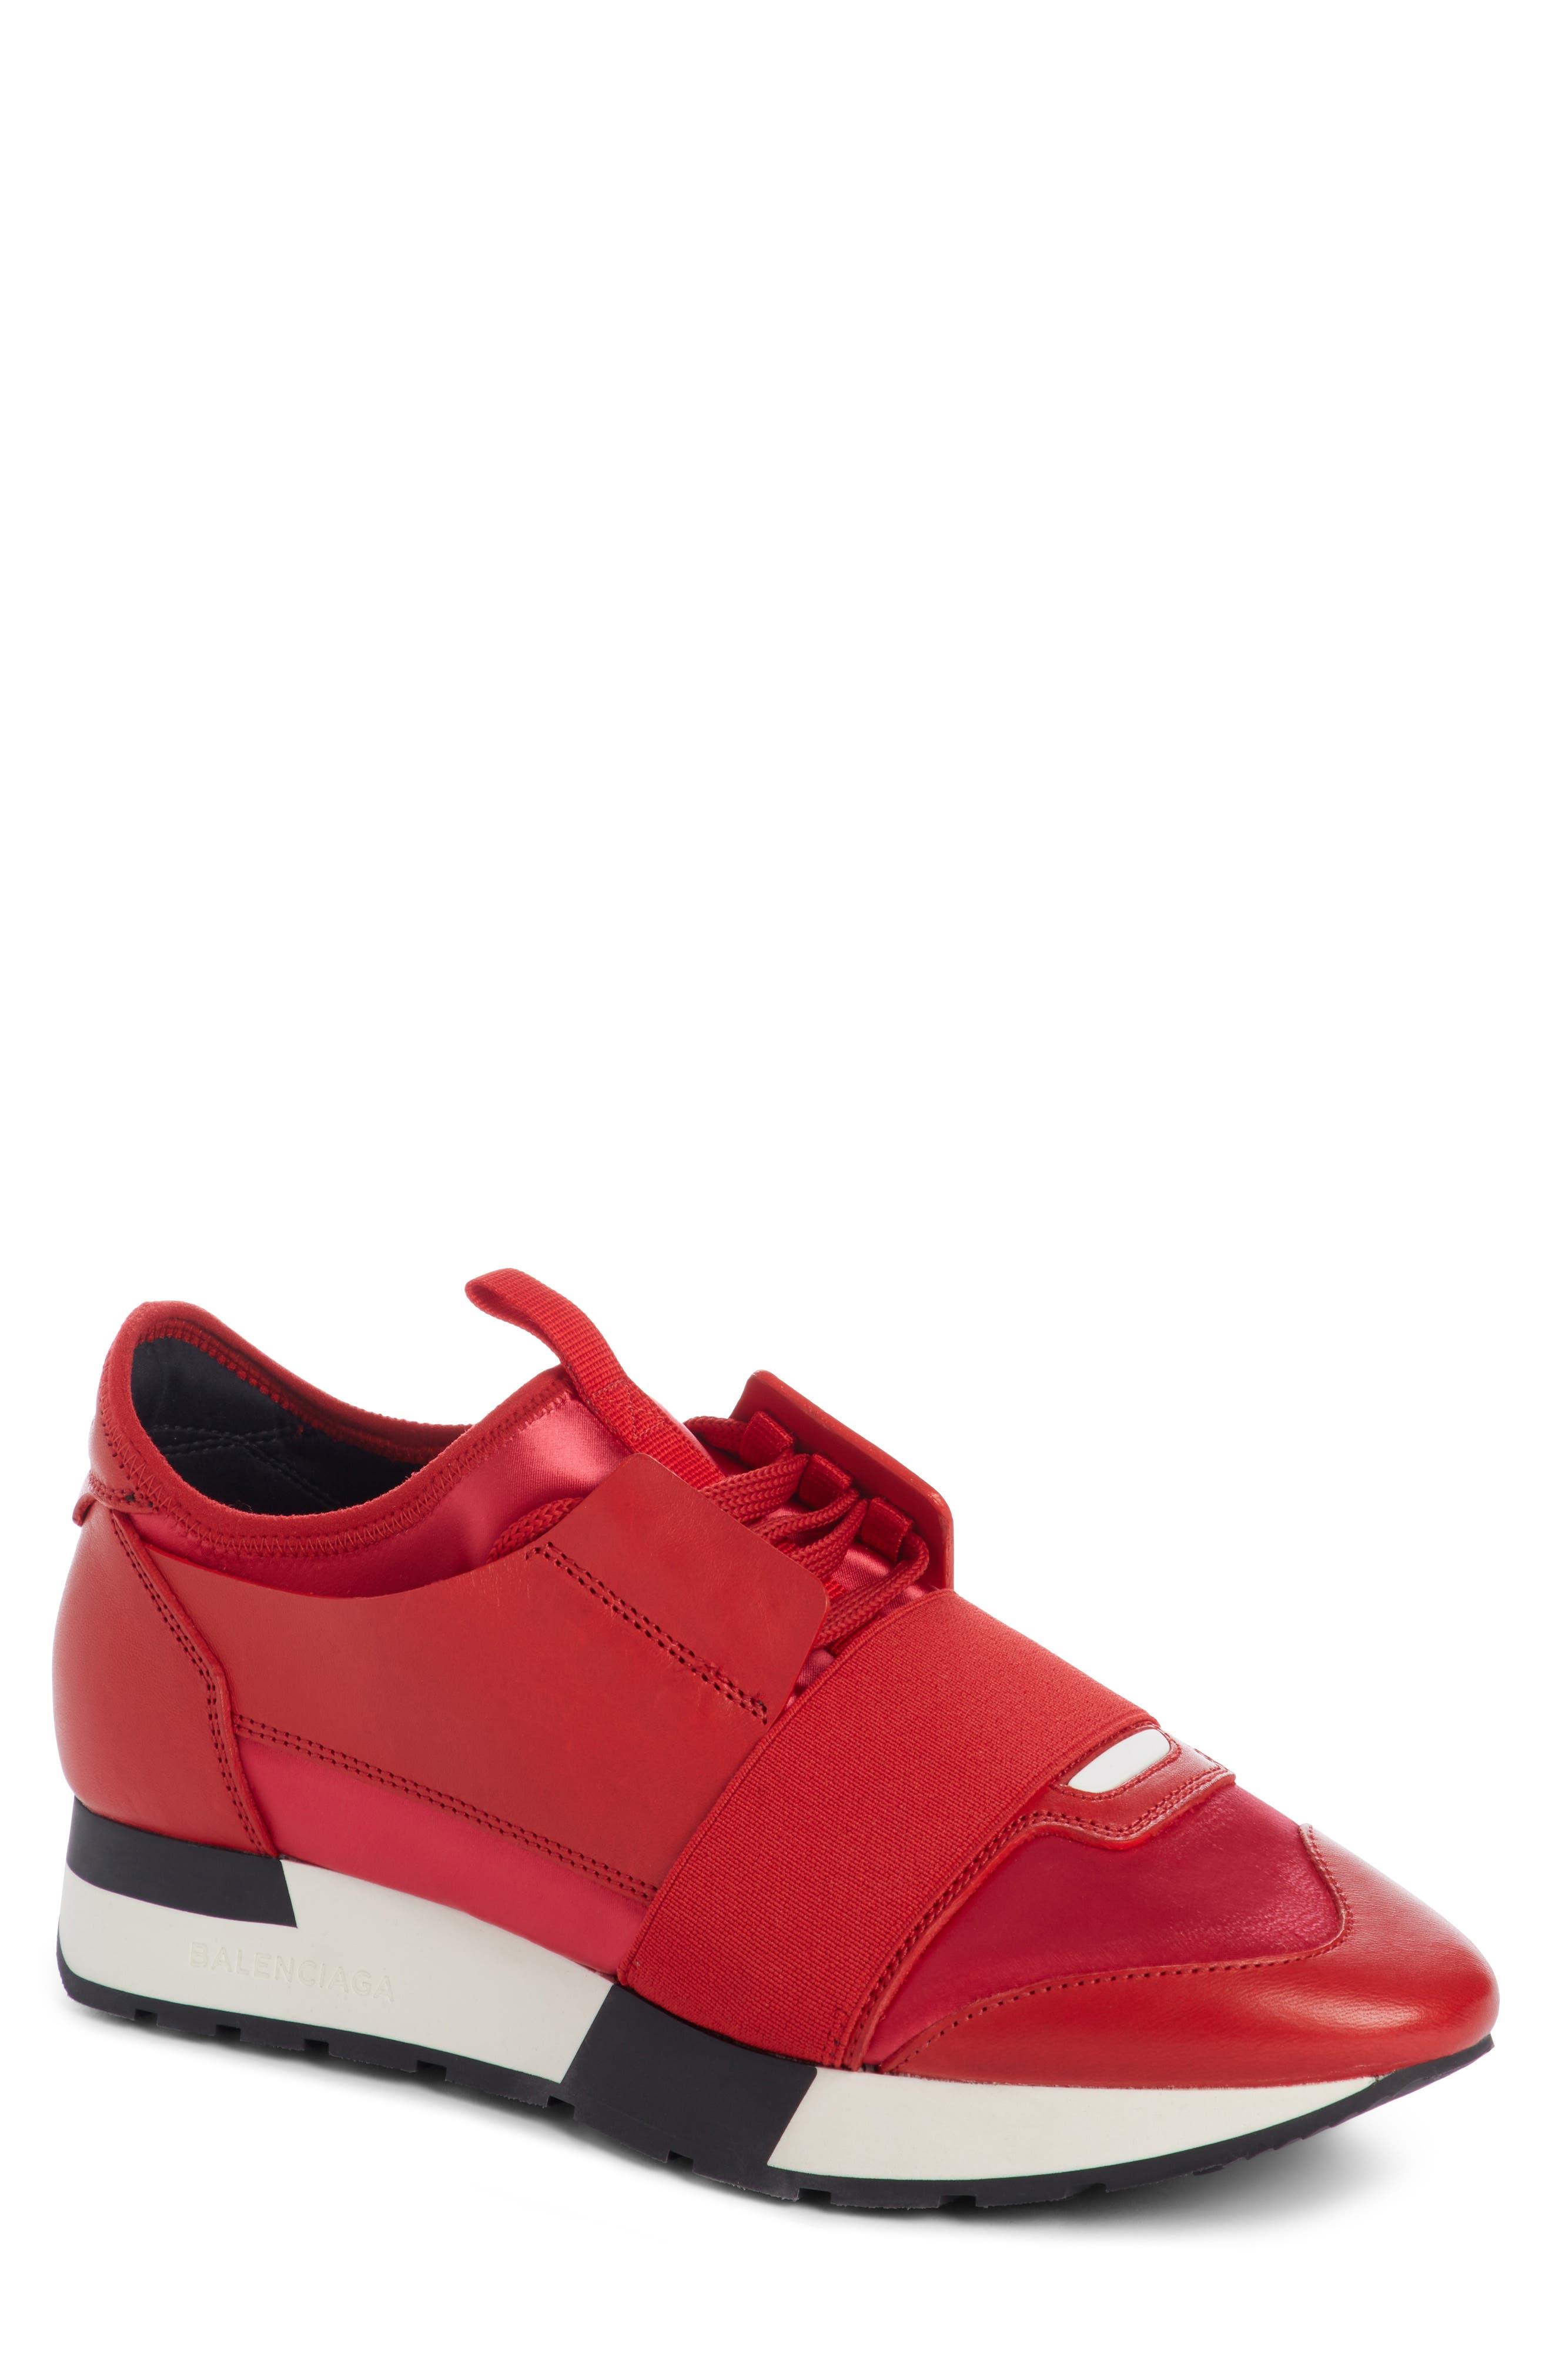 Main Image - Balenciaga Mixed Media Trainer Sneaker (Women)